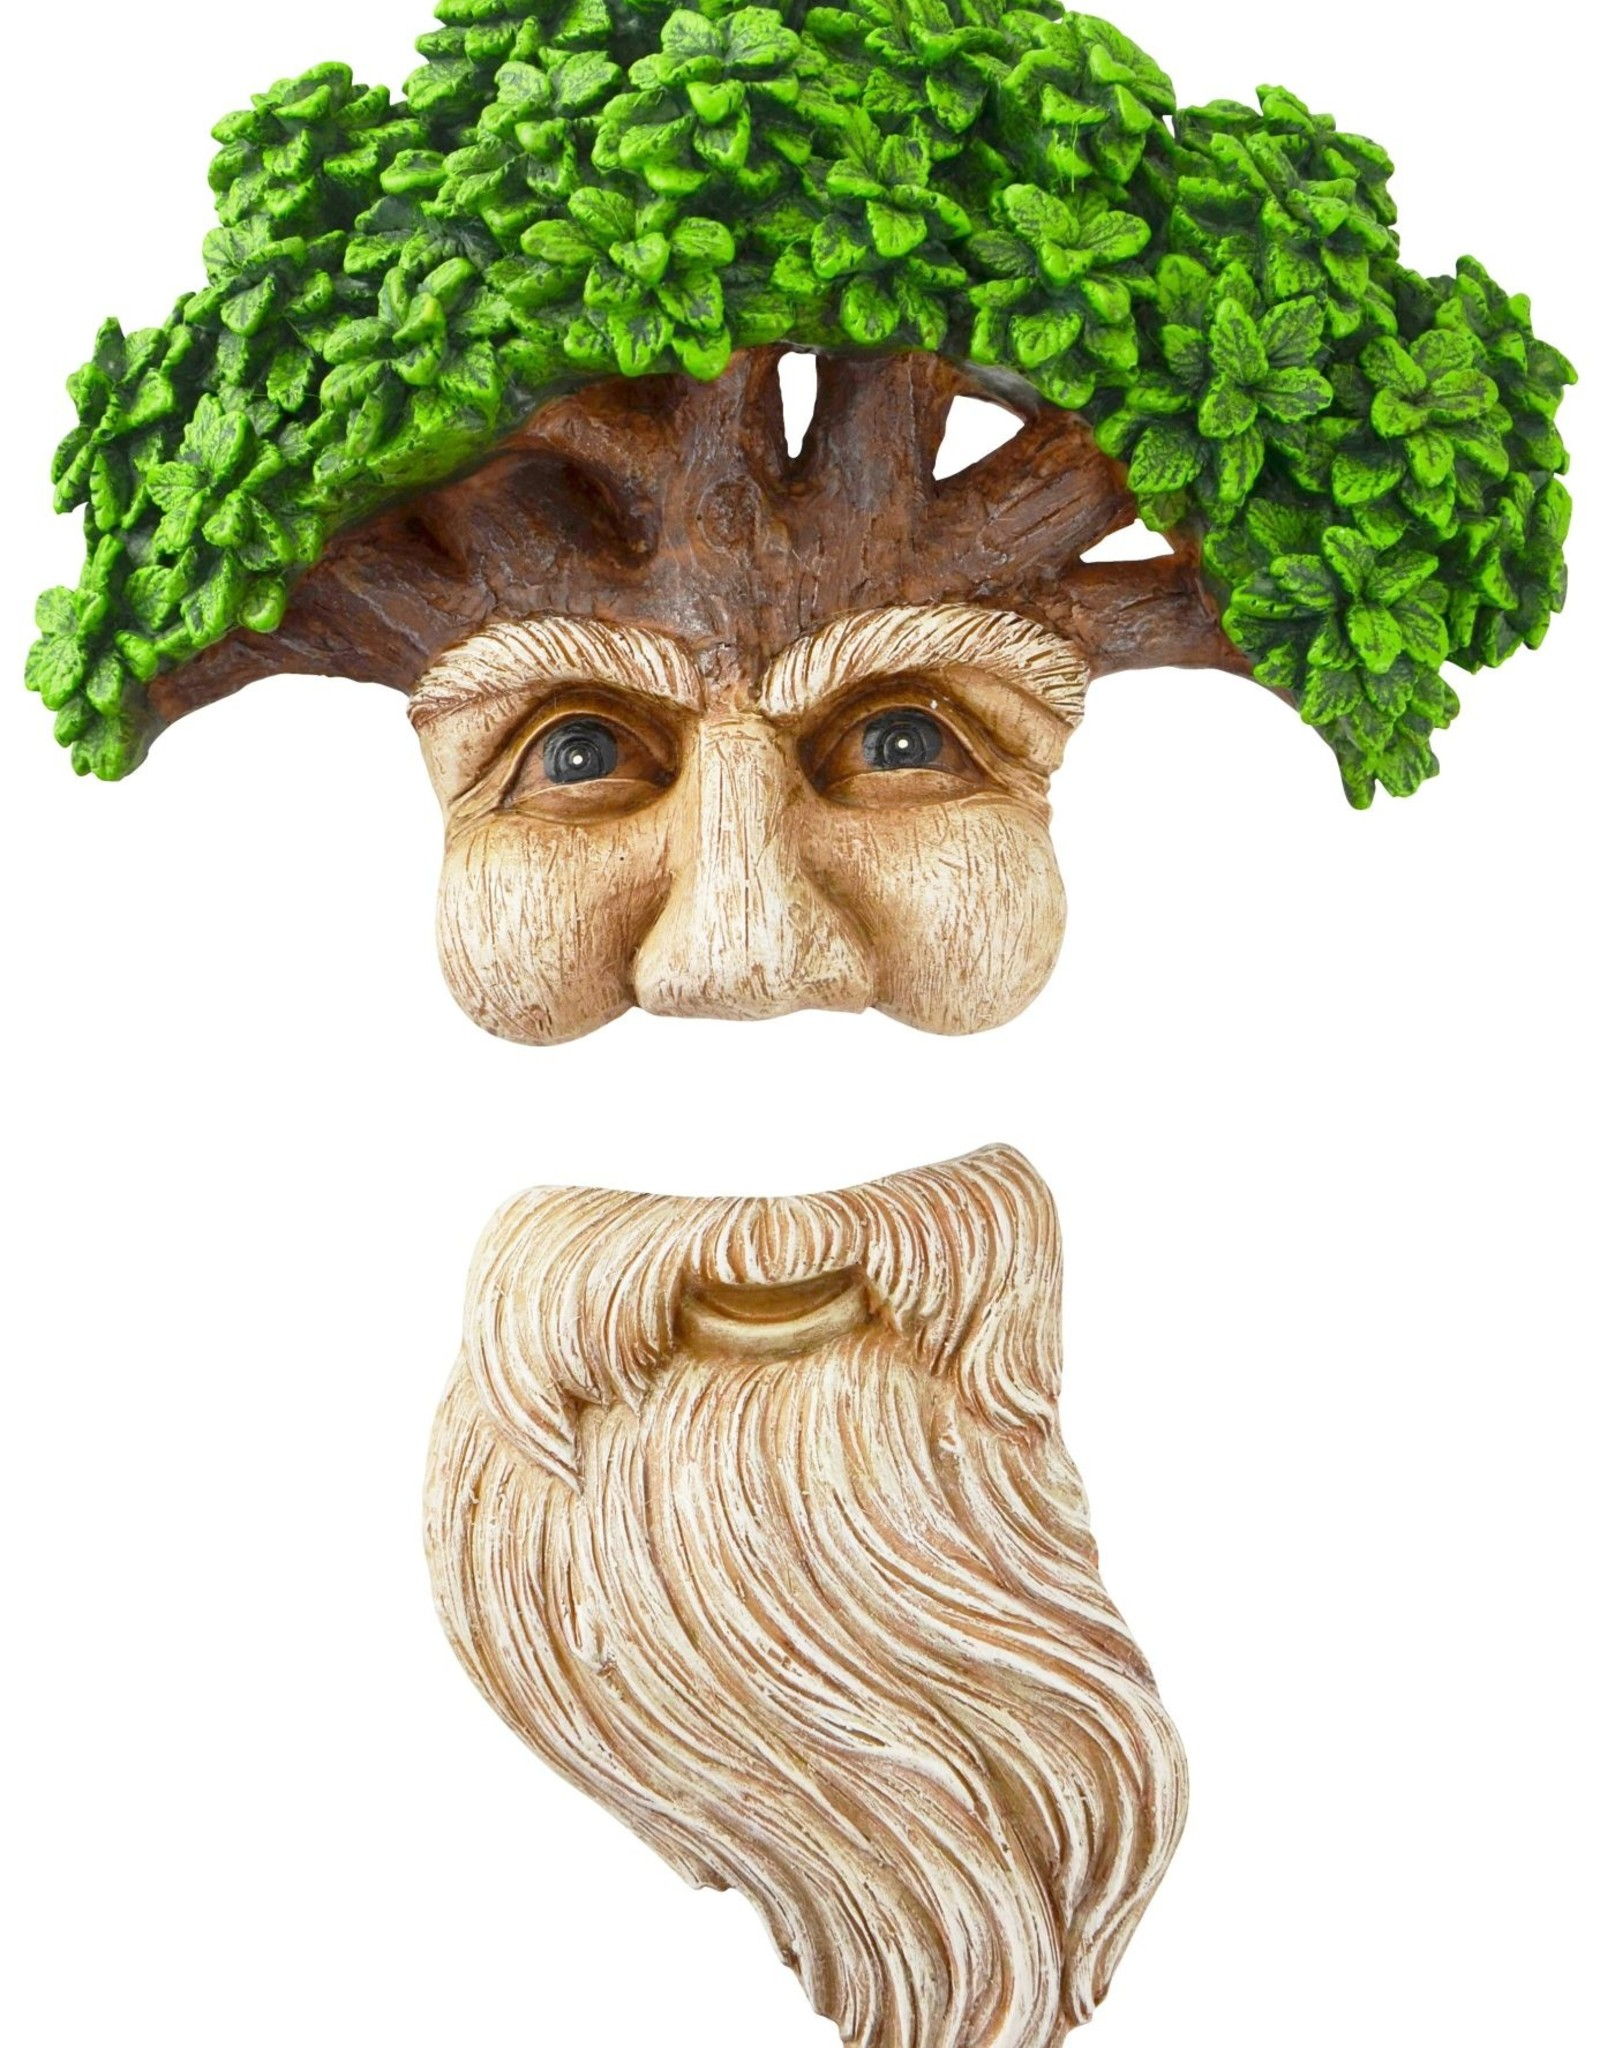 Wise Man & His Beard - Tree Face